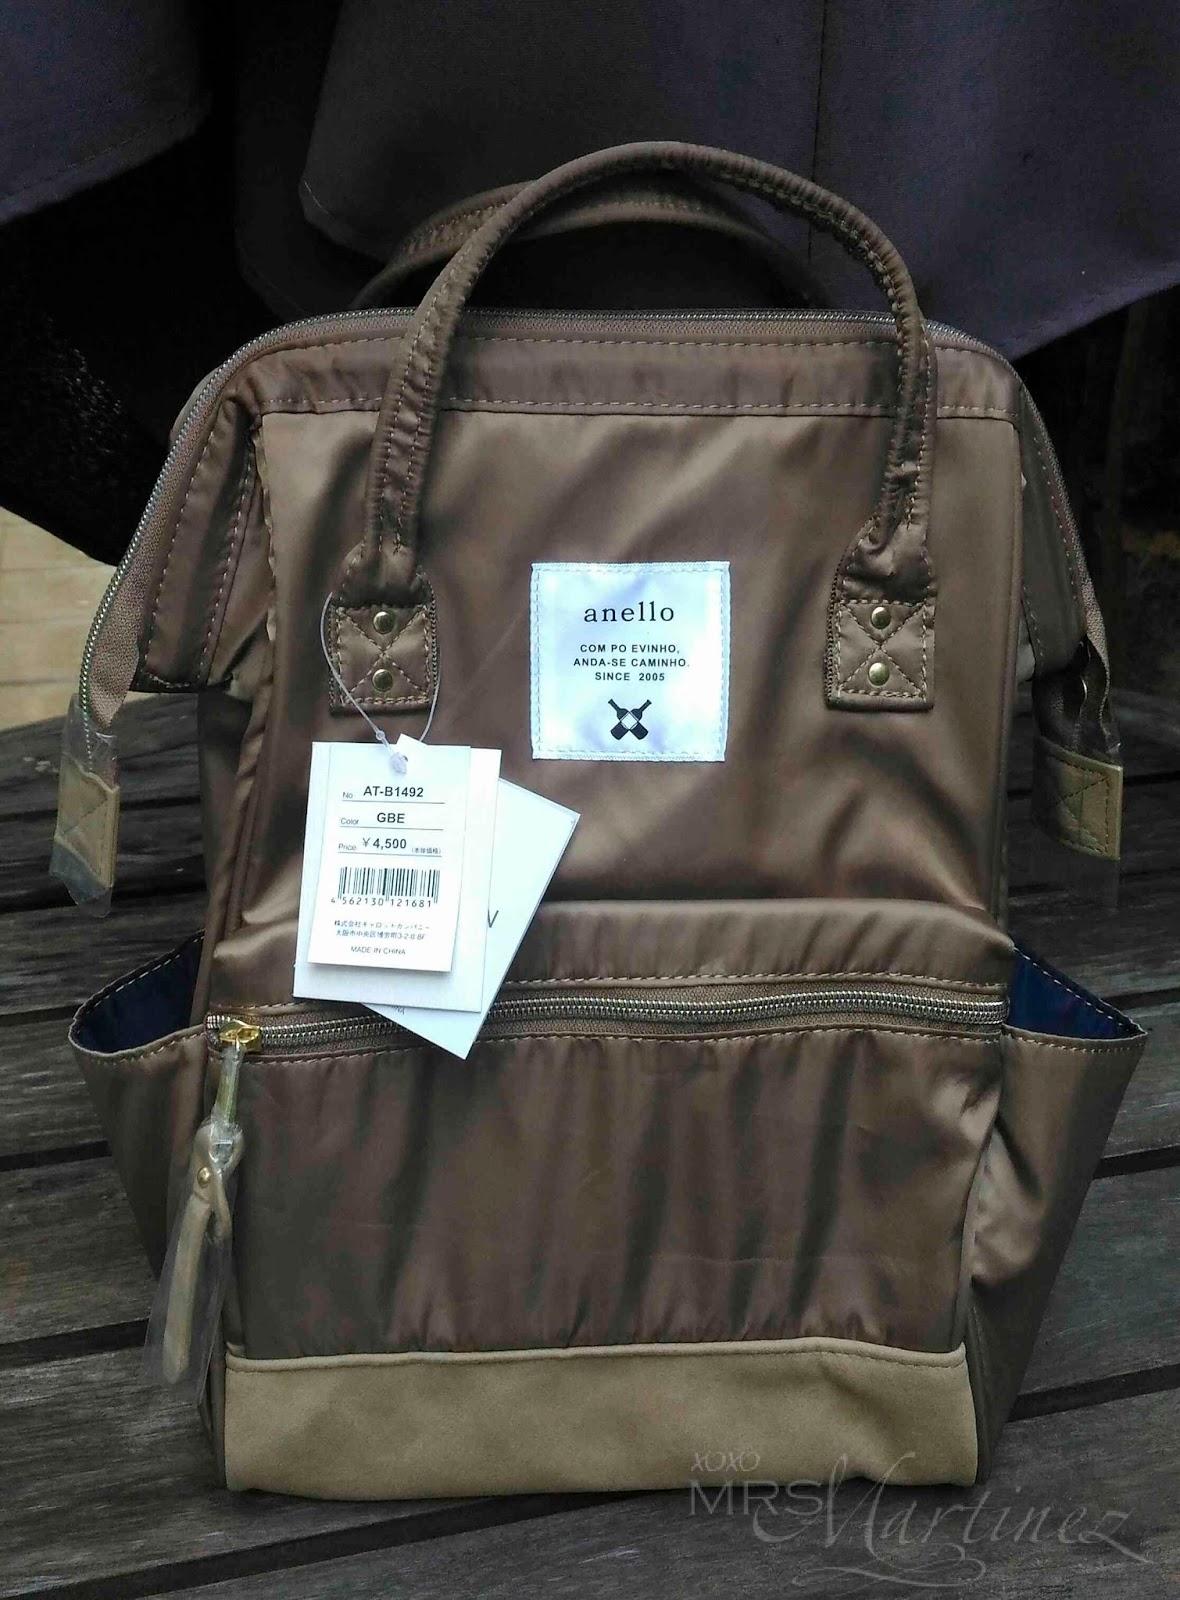 Anello Nylon Mini Backpack in Grey Beige   How to Spot a Fake ... b61edcf5c1